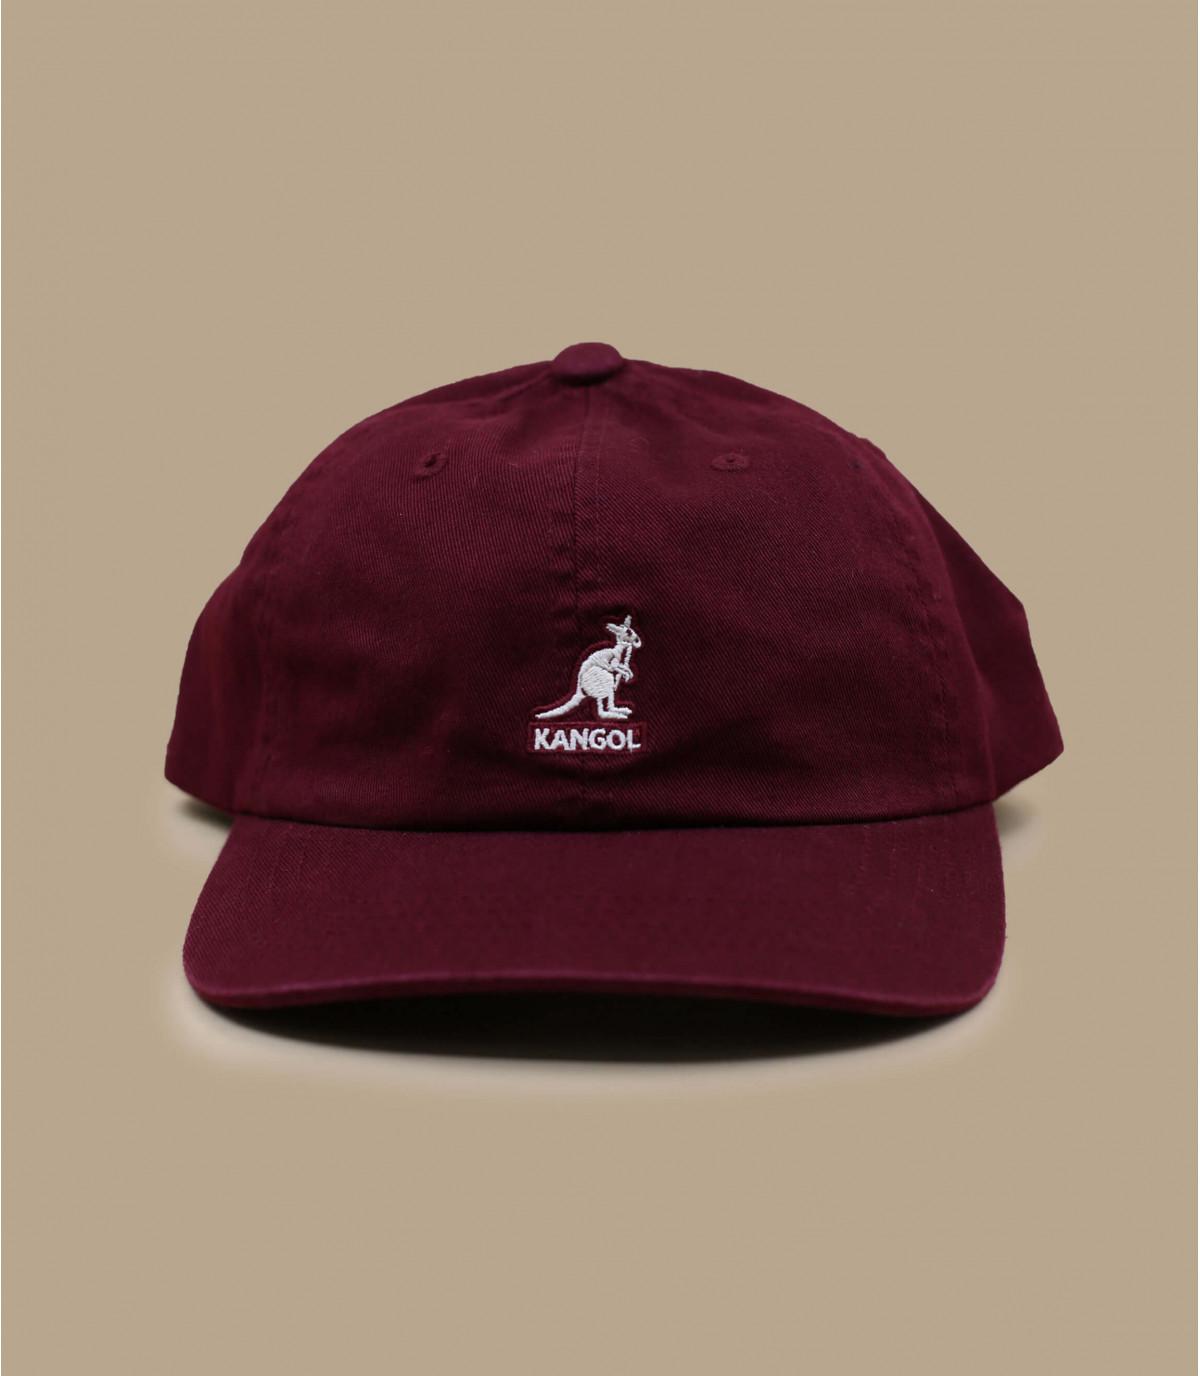 burgundy Kangol cap